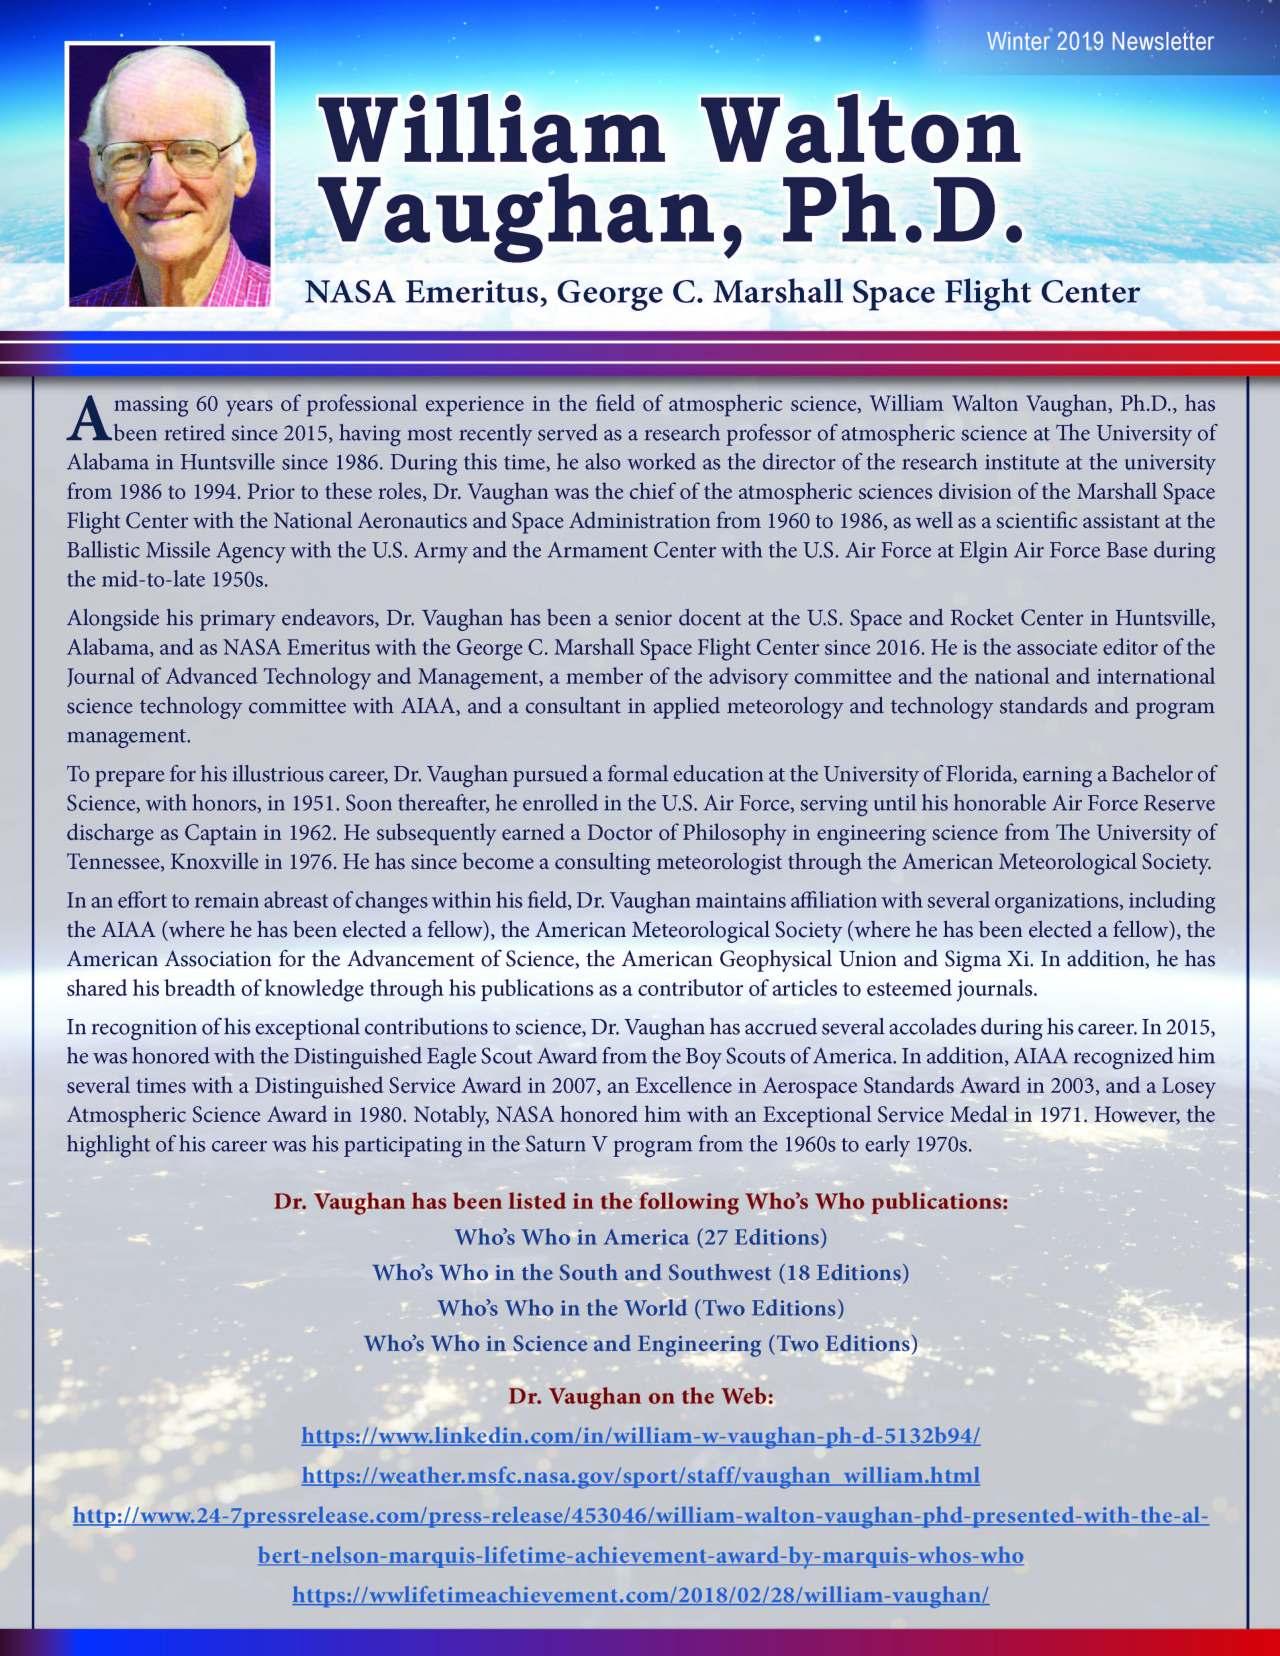 Vaughan, William 3771657_2653310 Newsletter REVISED.jpg